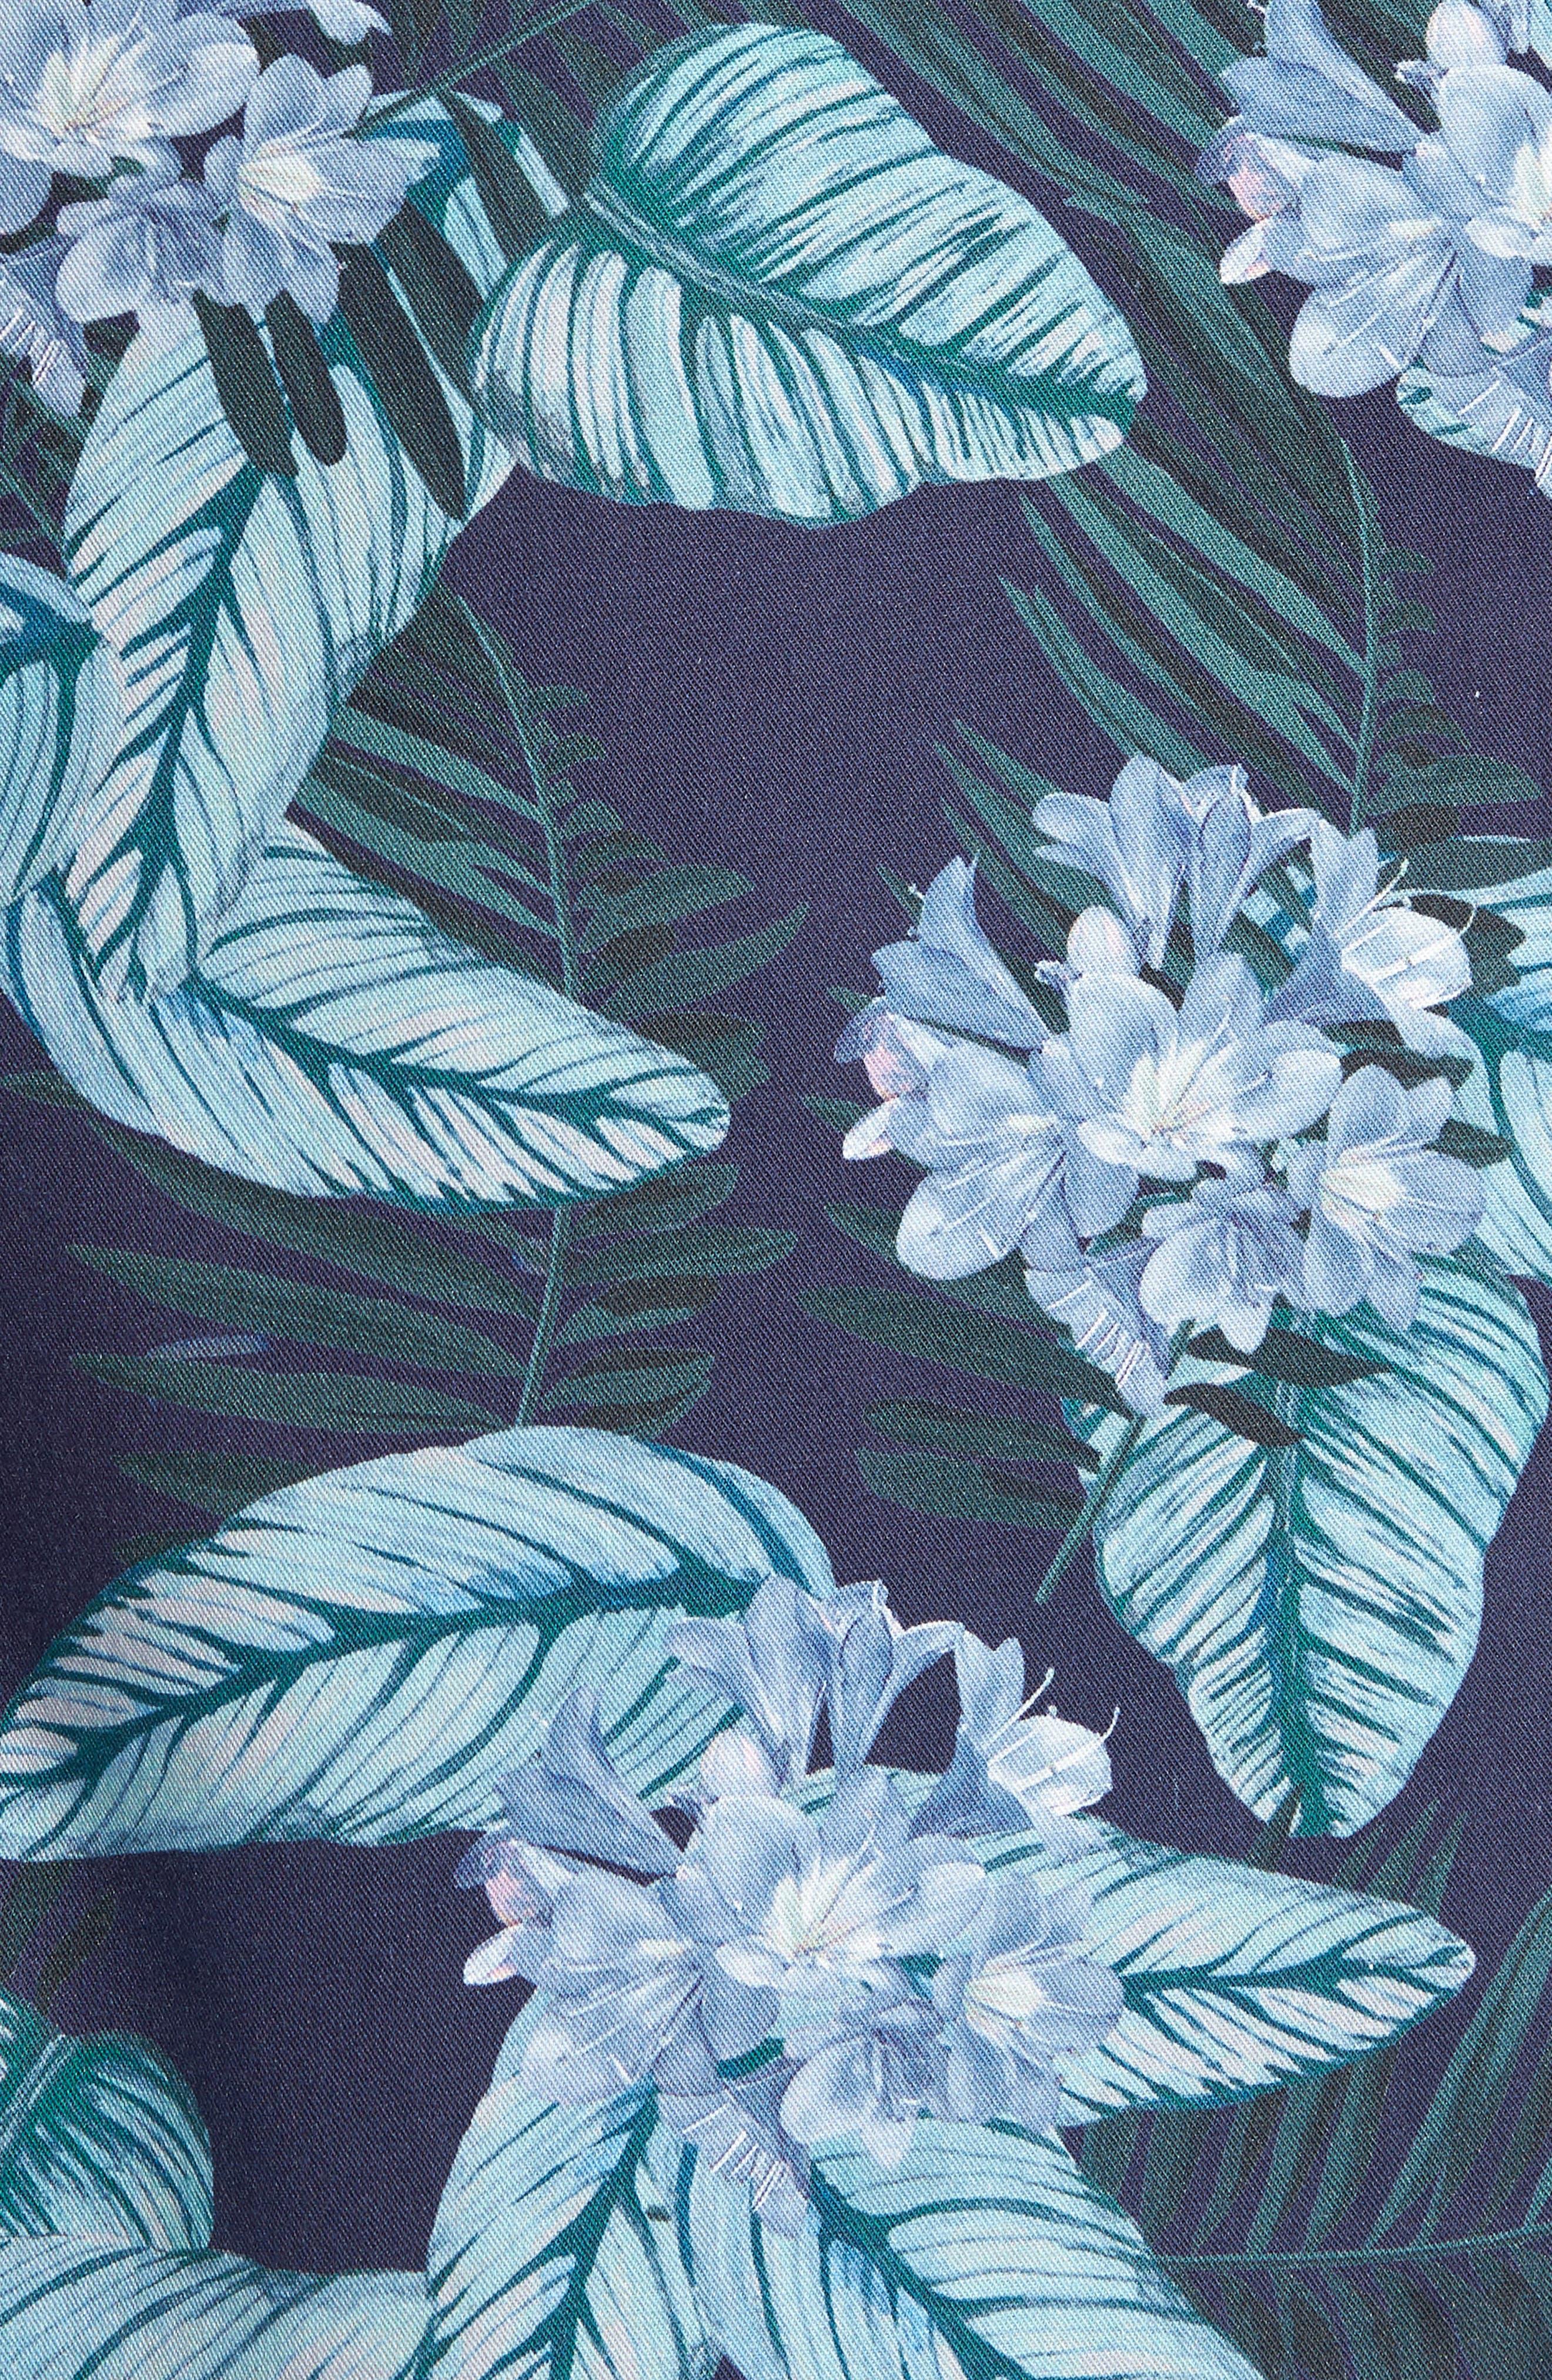 Folinor Slim Fit Floral Cotton Shirt,                             Alternate thumbnail 5, color,                             Navy